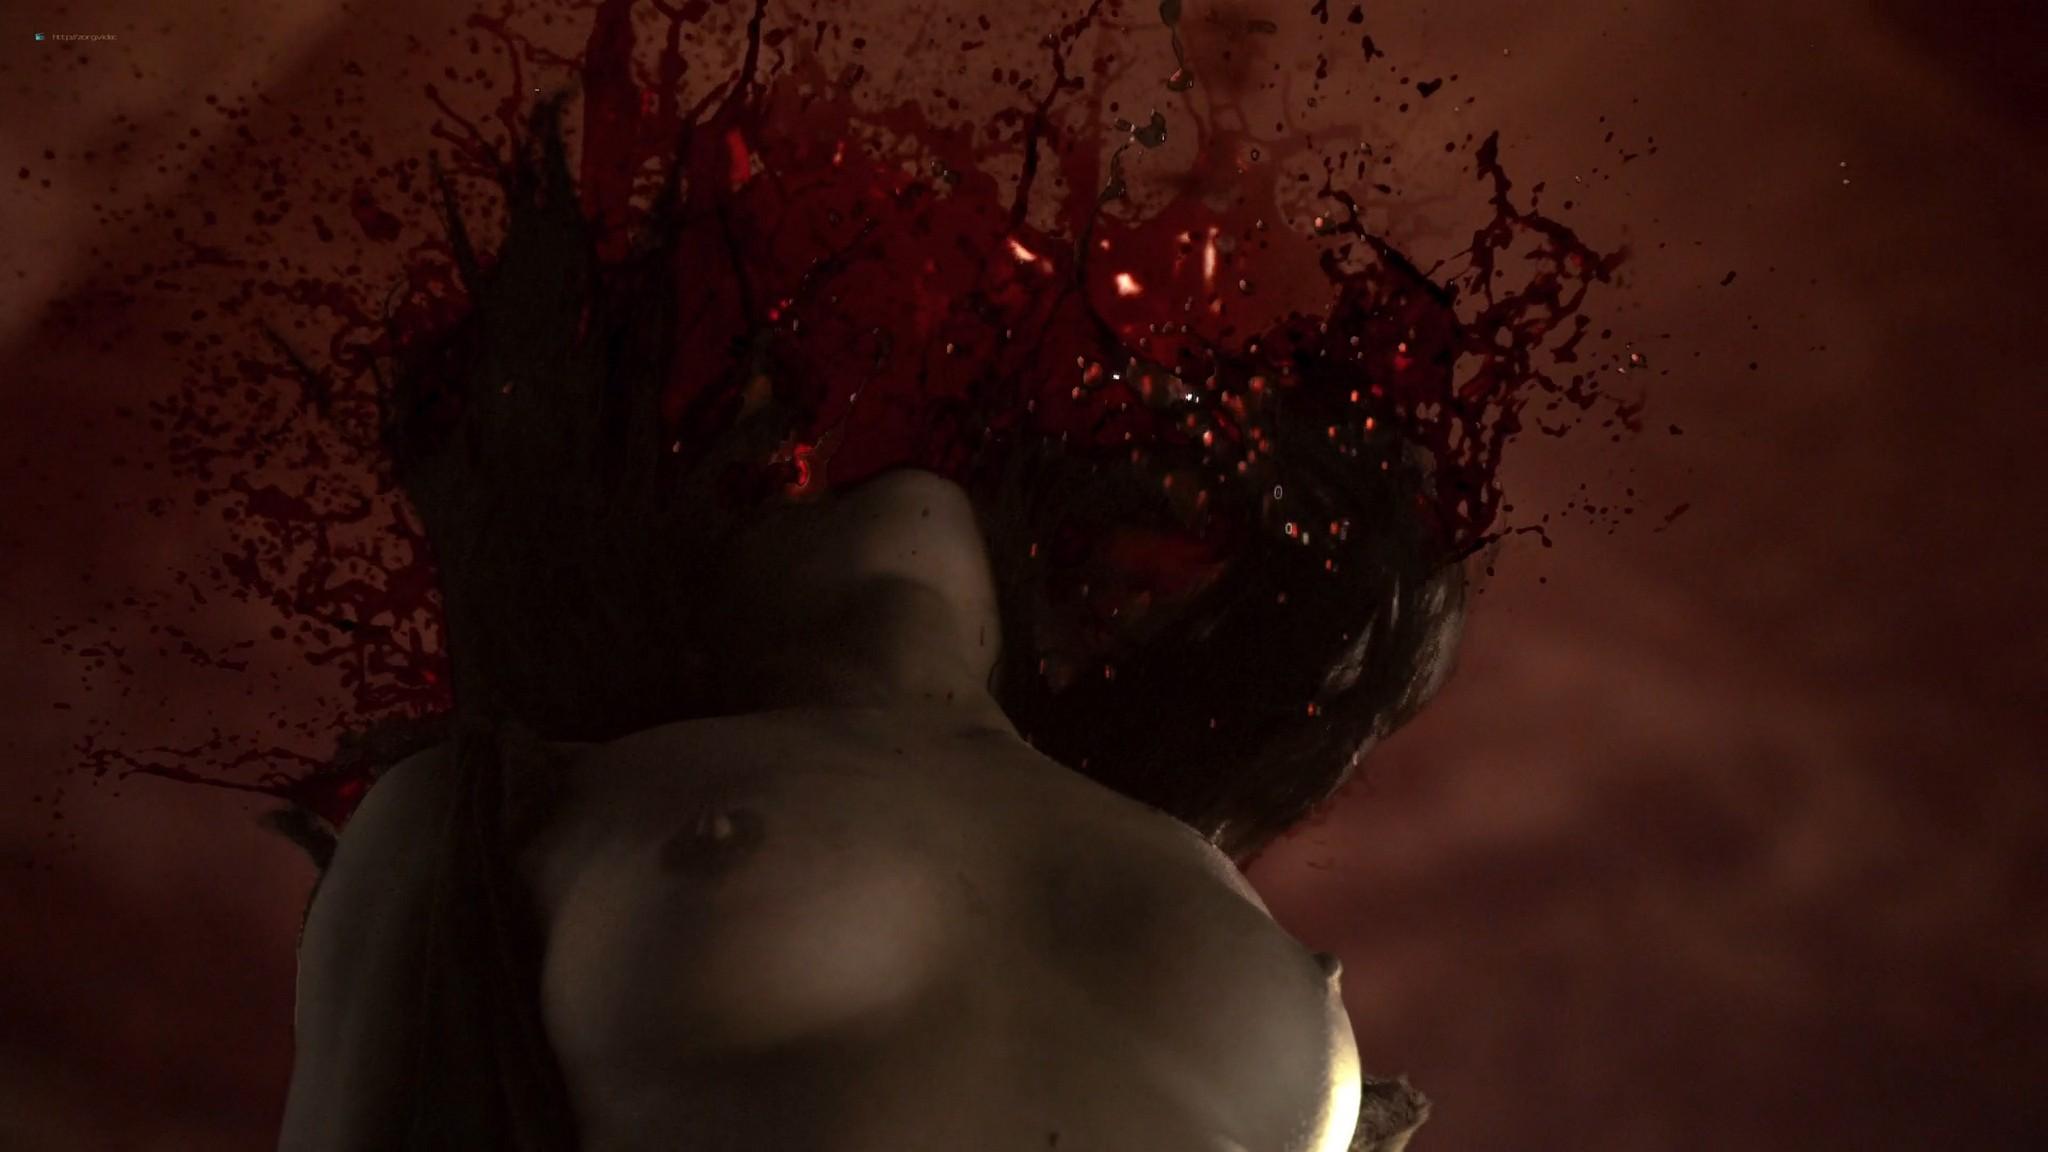 Lucy Lawless nude sex Erin Cummings, Aria Dickson nude too - Spartacus - Sacramentum Gladiatorum (2010) s1e2 HD 1080p (10)